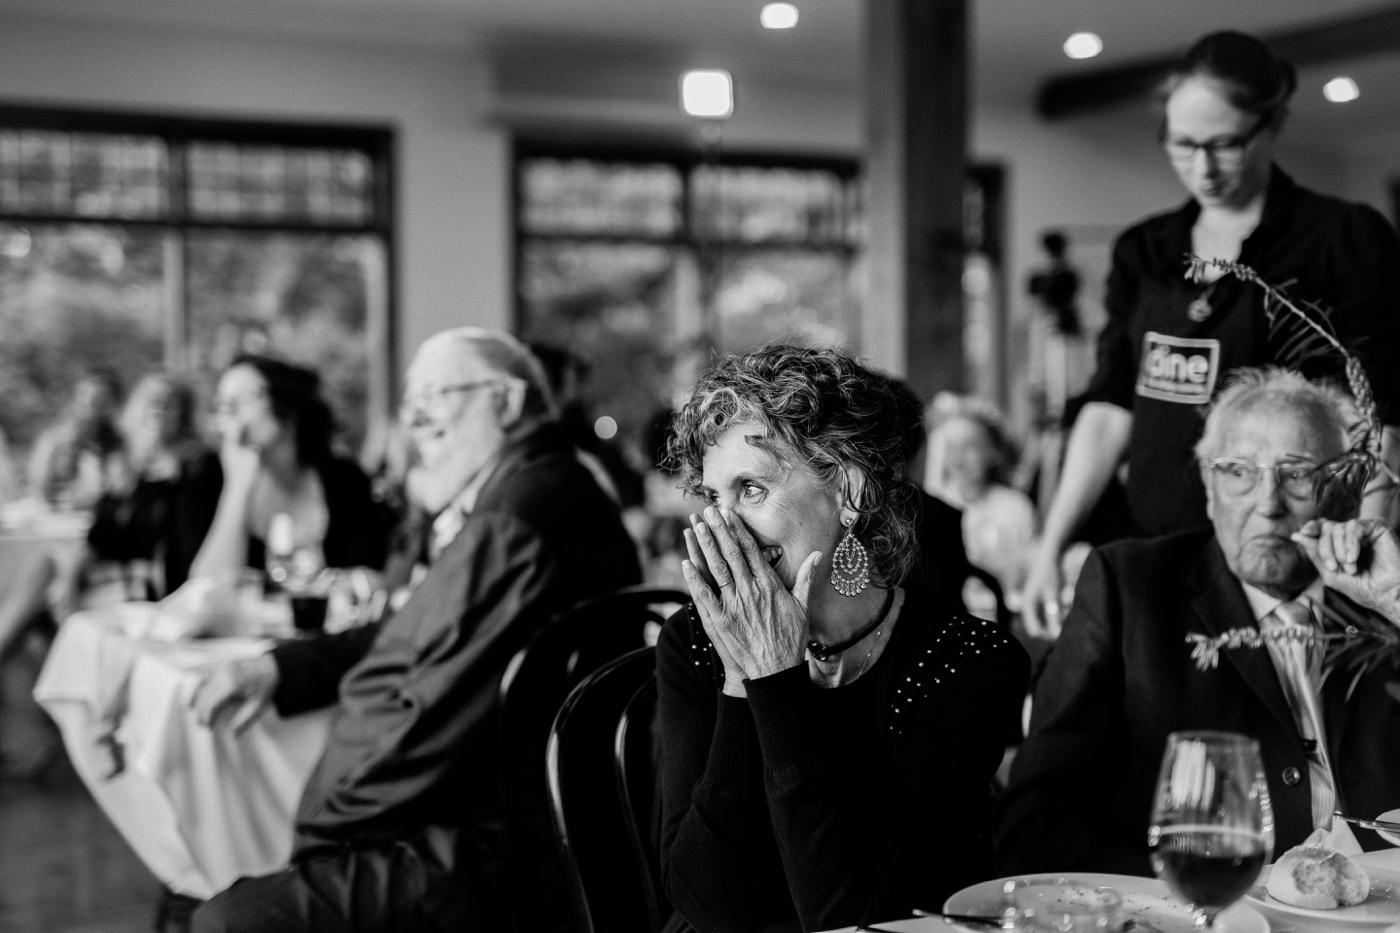 Maddy & Wes - K1 by Geoff Hardy Wedding - Adelaide Wedding Photographer - Natural wedding photography in Adelaide - Katherine Schultz_0058.jpg